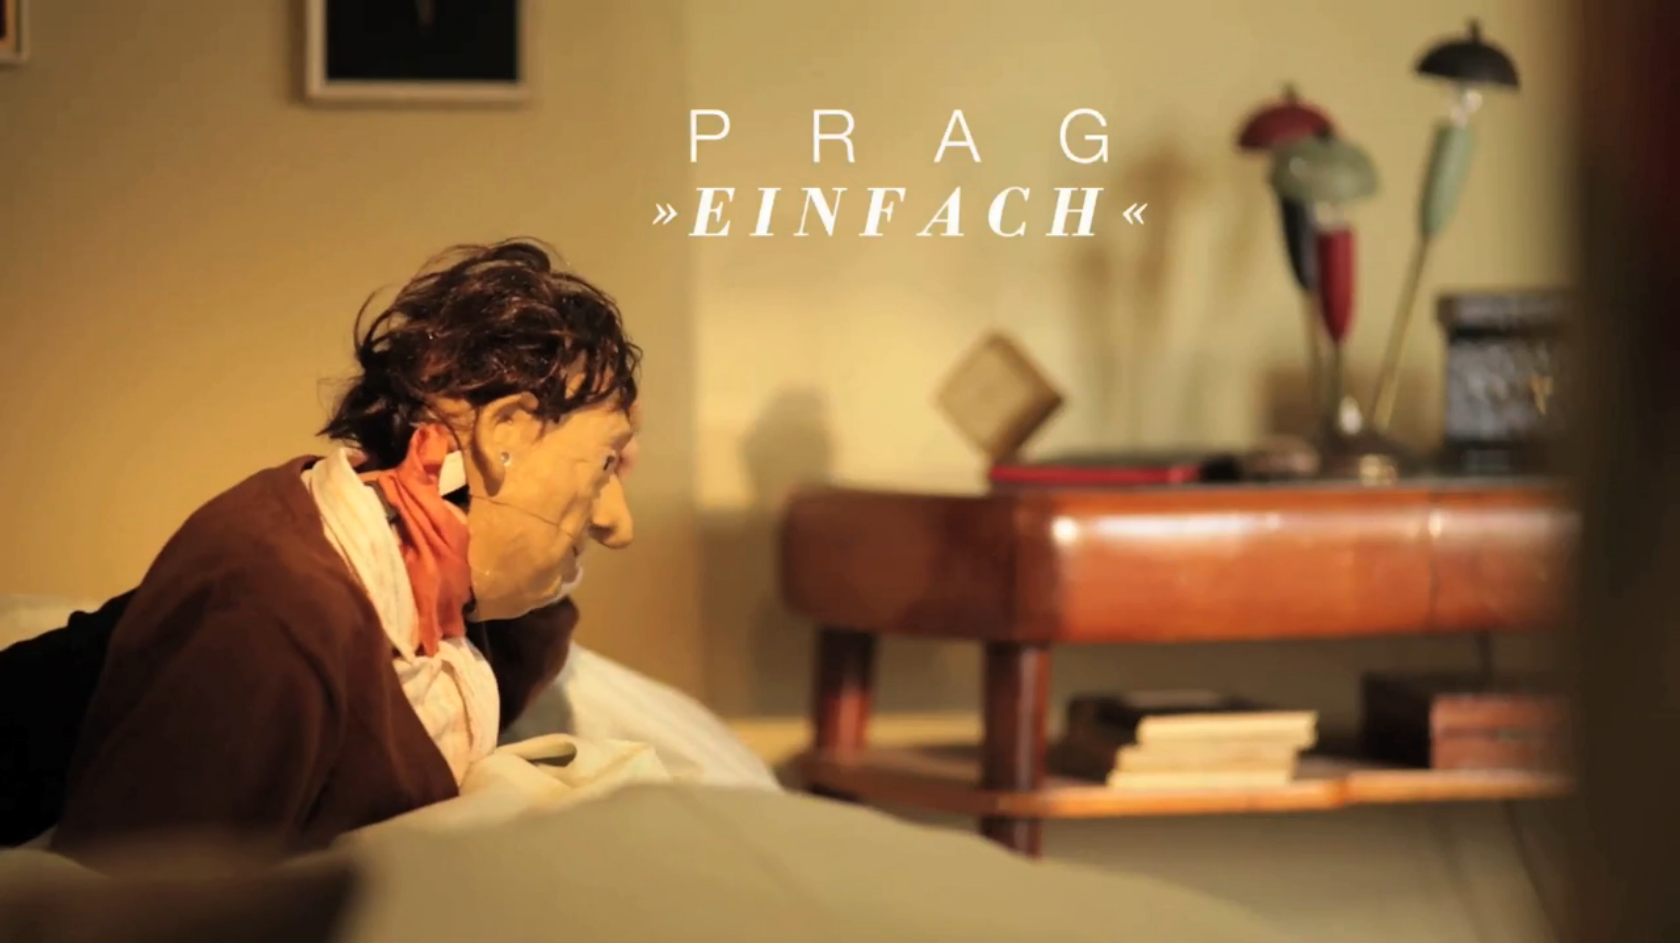 PRAG_EINFACH_TITEL